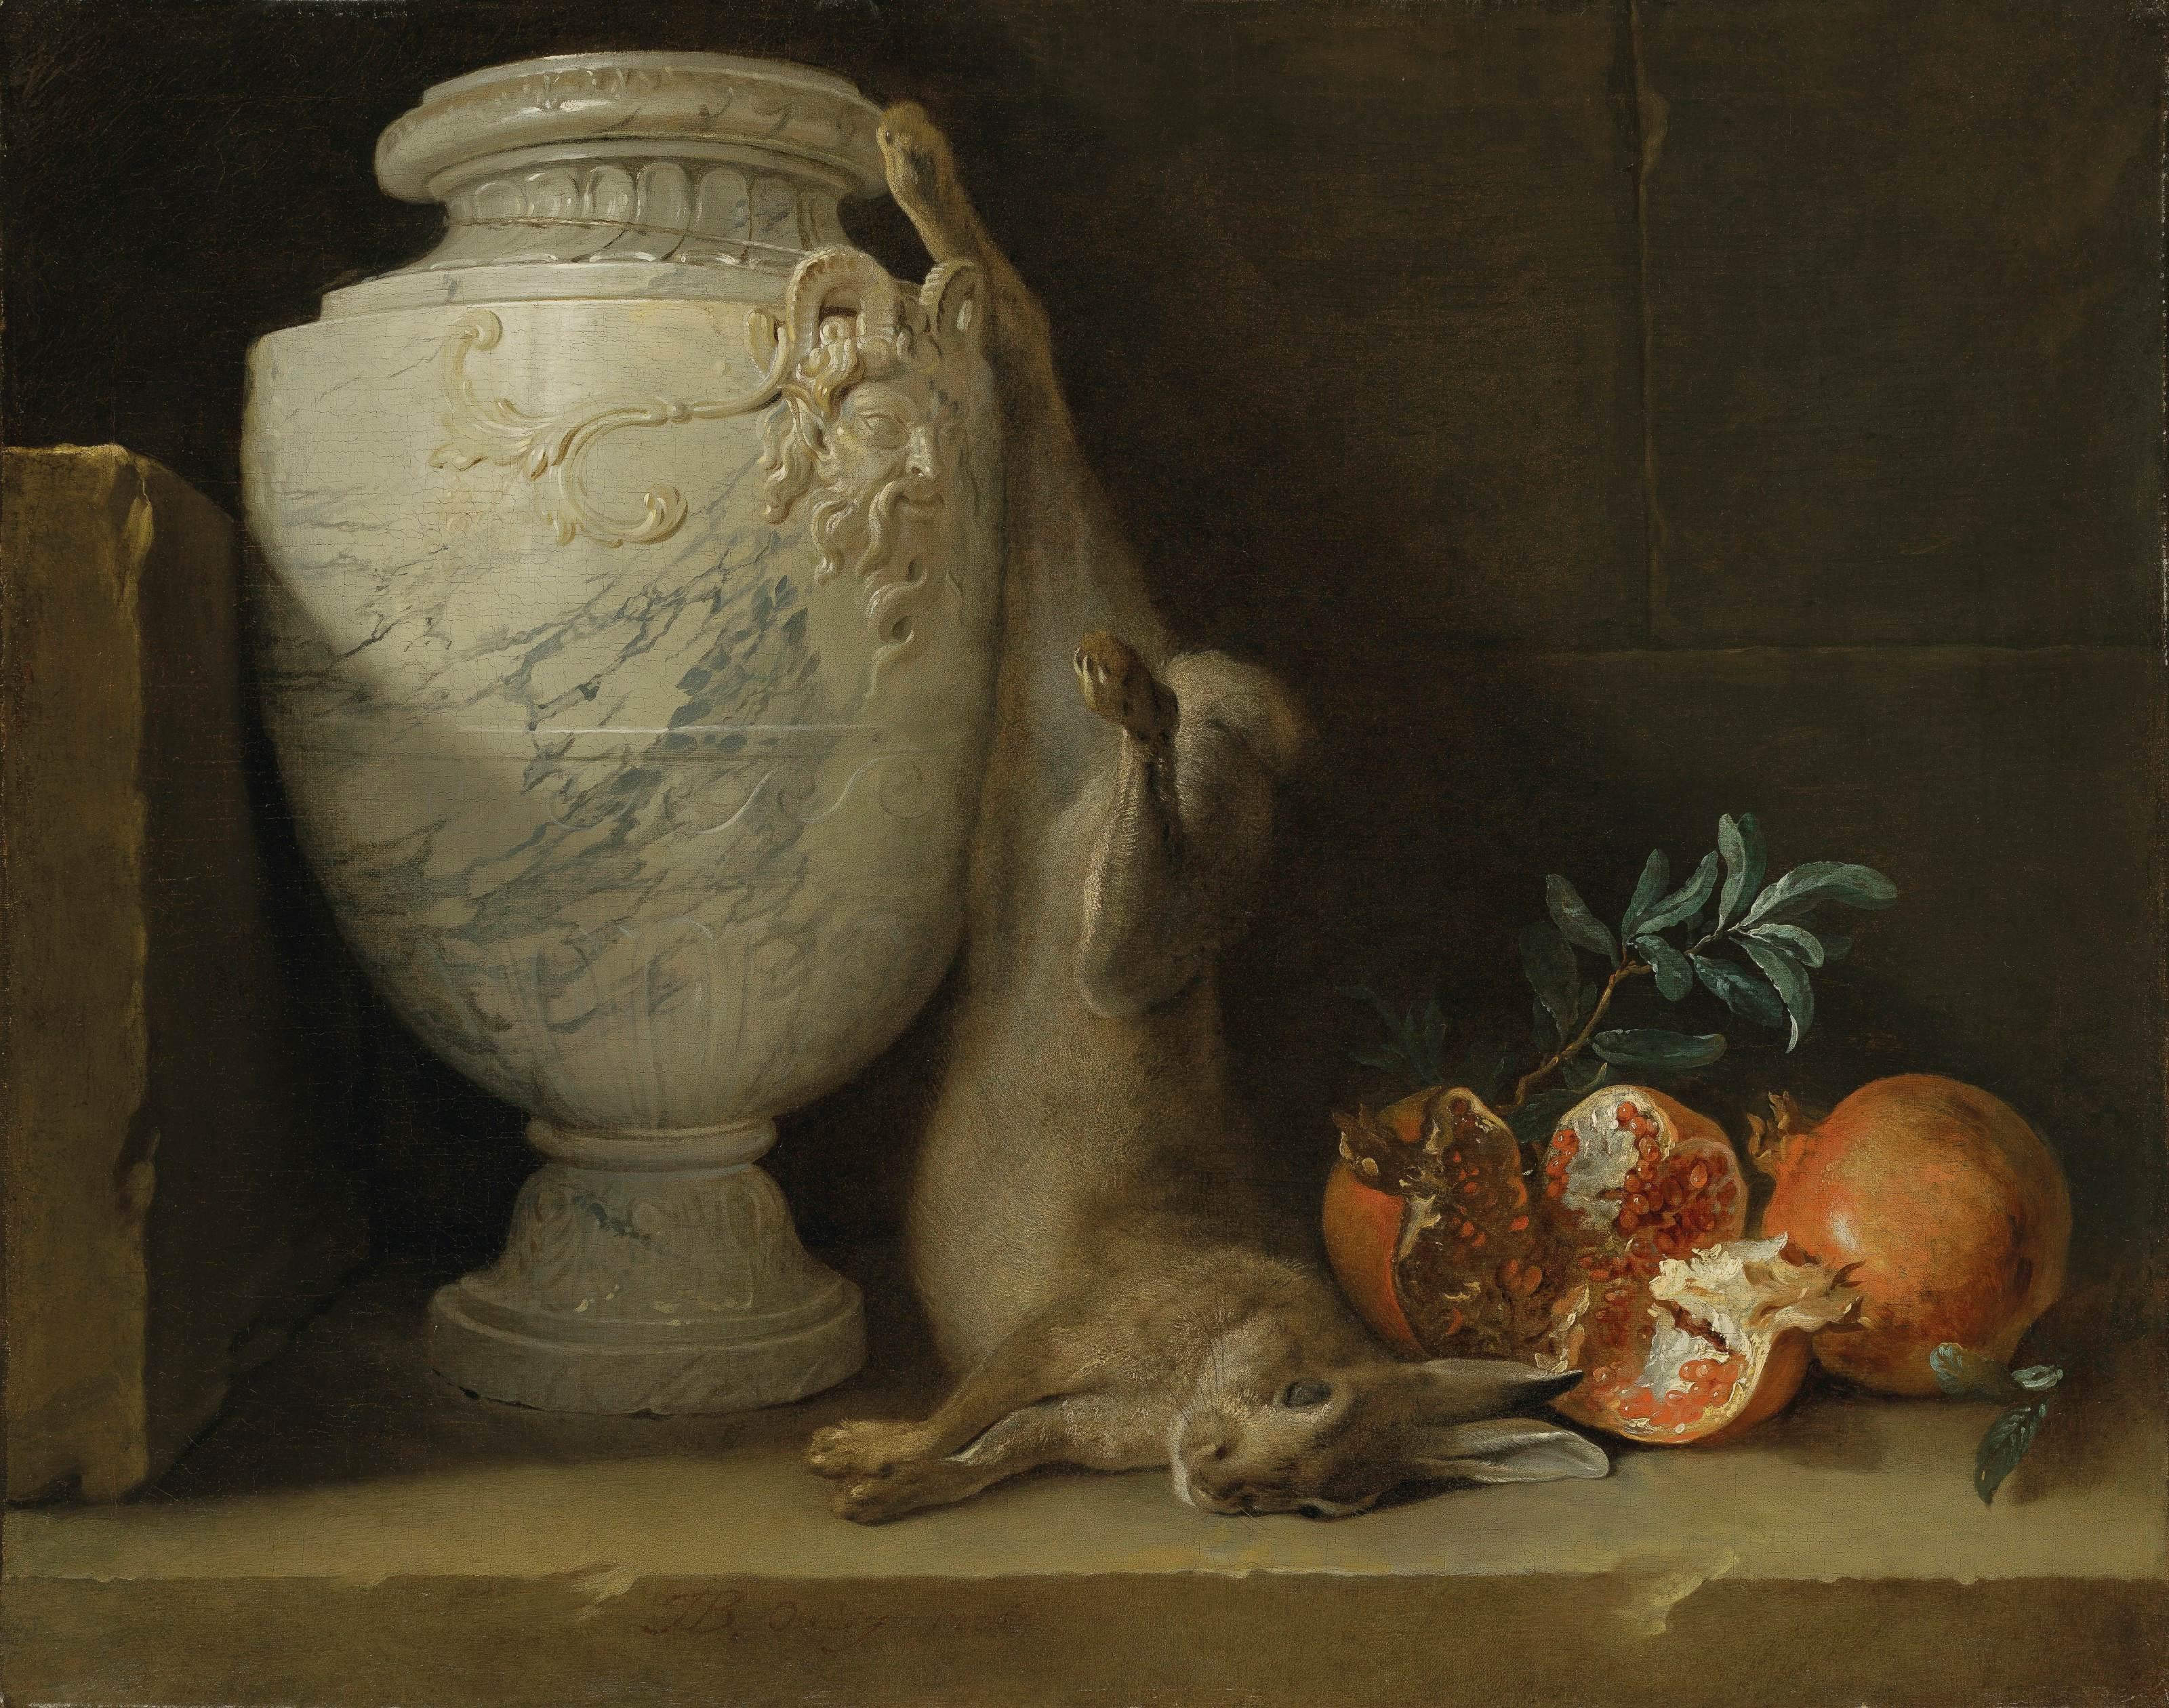 Jean-Baptiste Oudry (Paris 1686-1755 Beauvais)